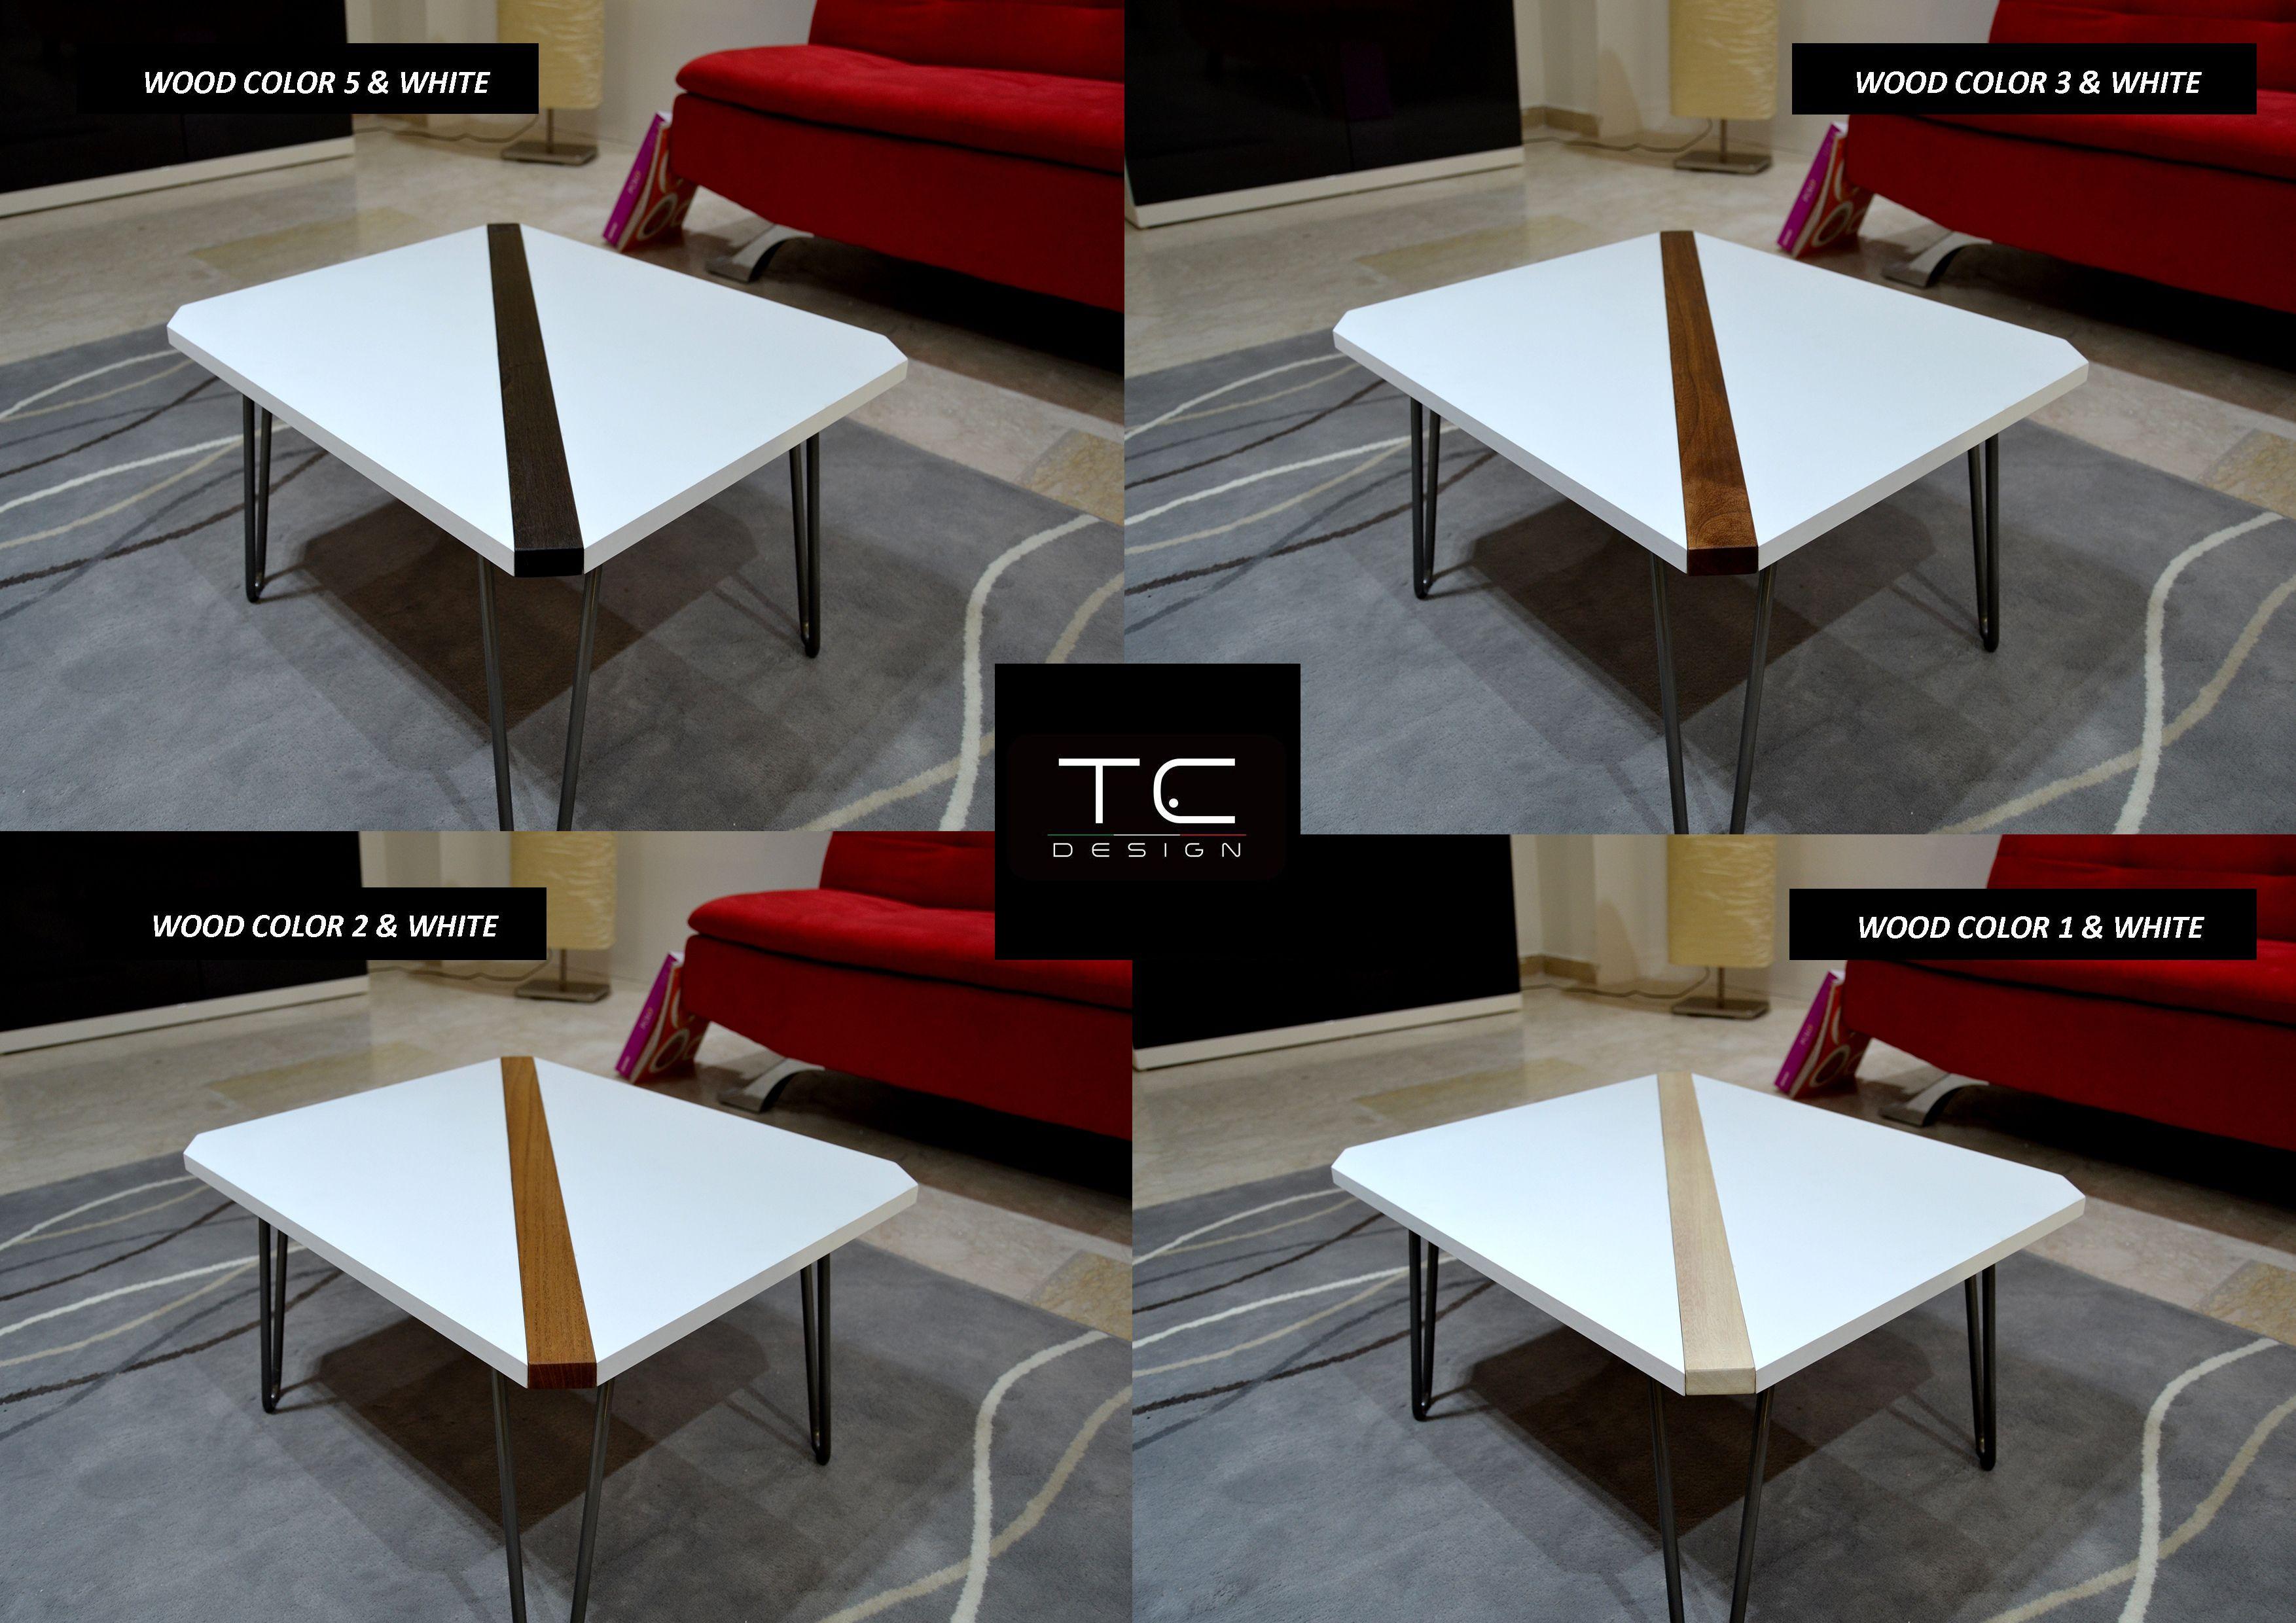 tavolini da soggiorno tavolini da soggiorno in legno tavolini da ...